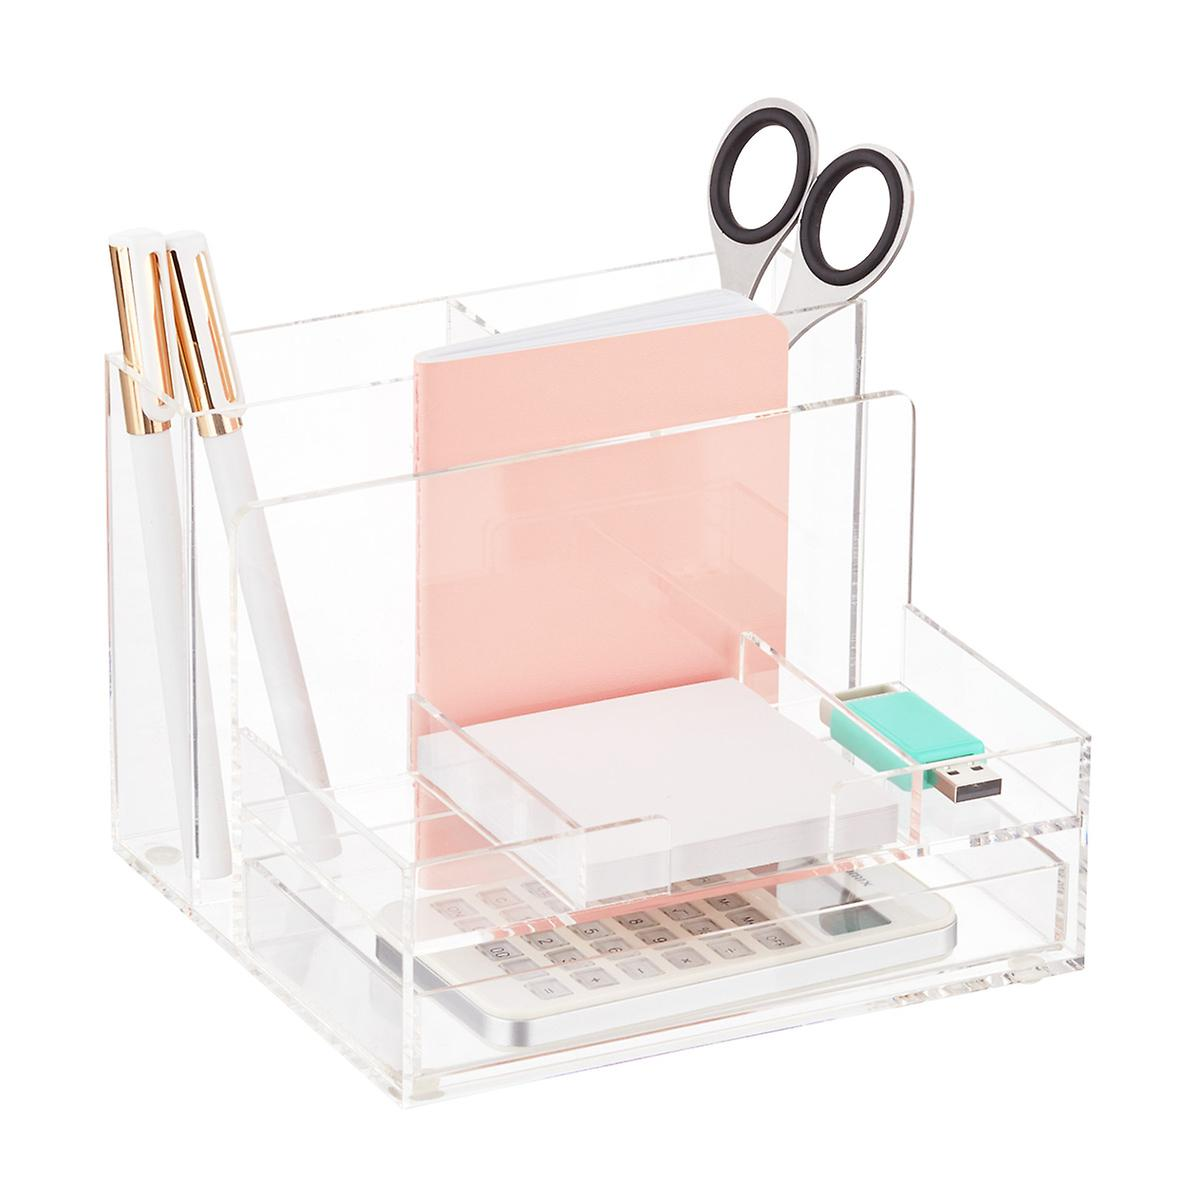 Small Acrylic Desktop Organizer